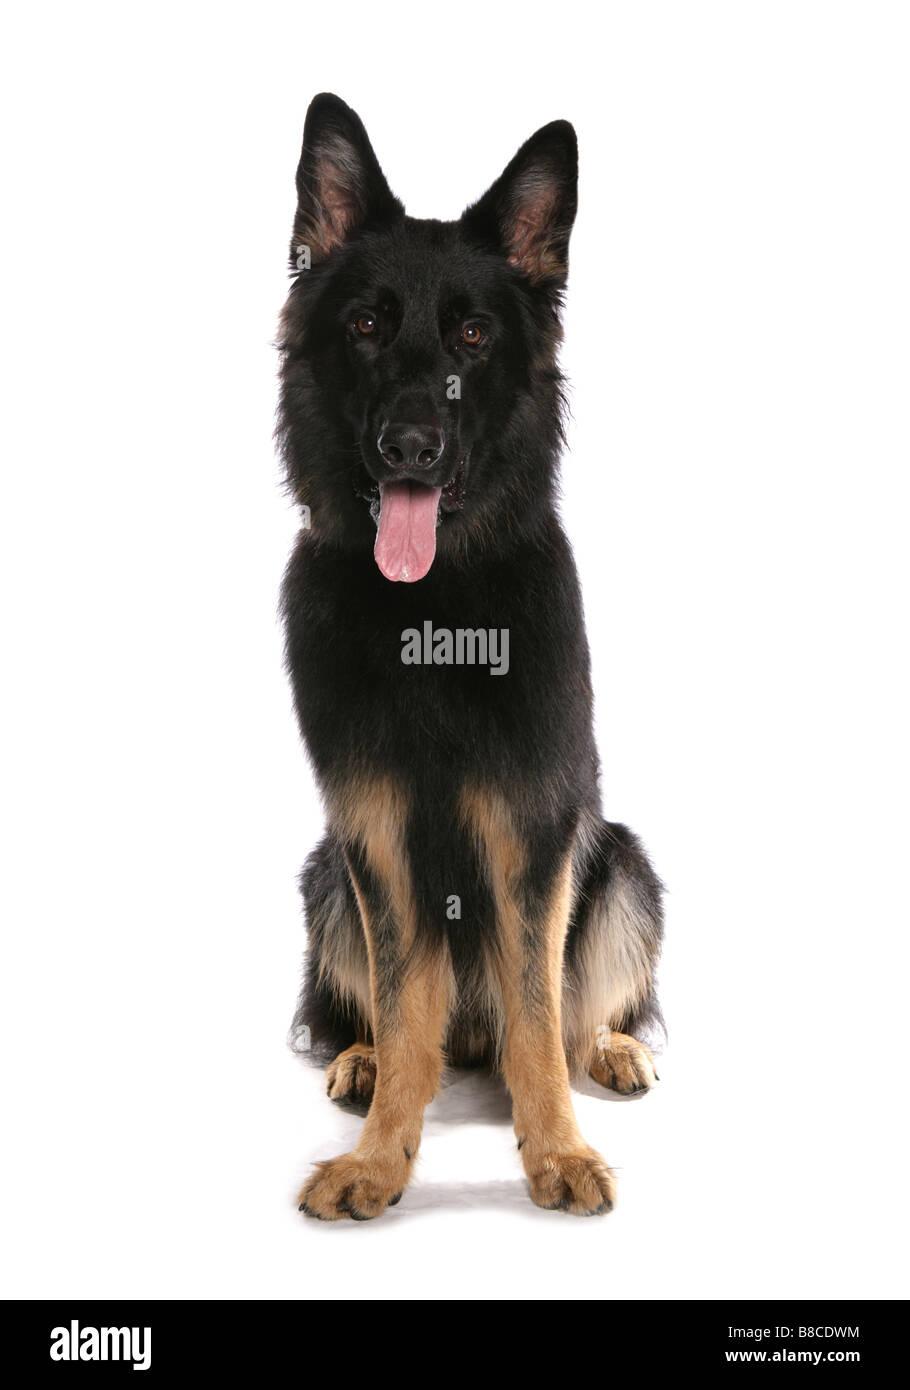 german shepherd dog sitting studio - Stock Image